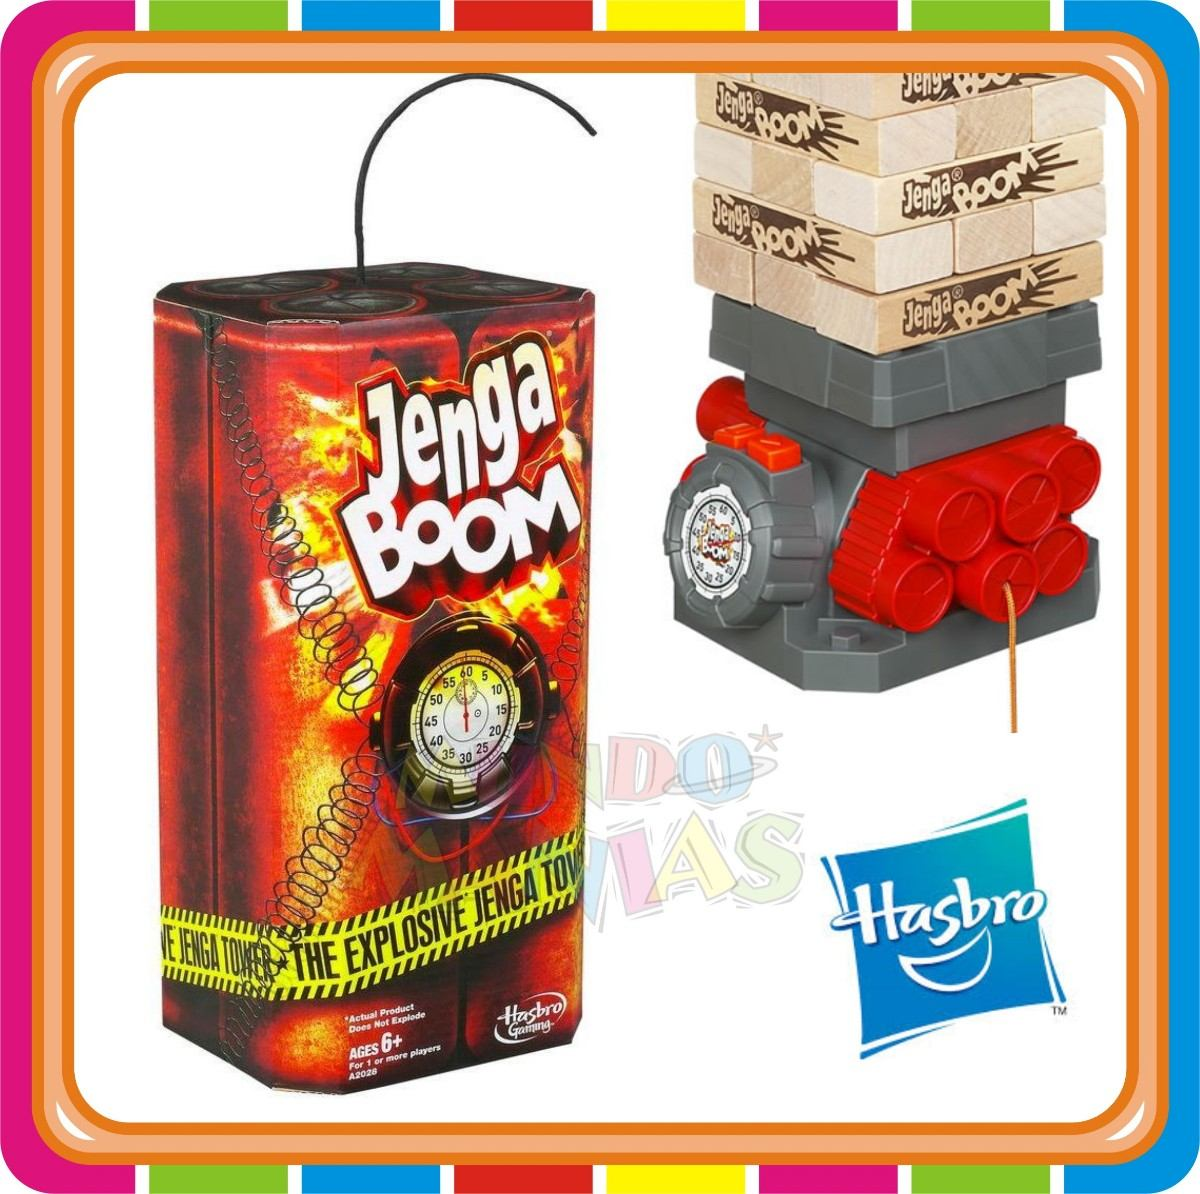 Jenga Boom Juego De Mesa Contra Reloj Hasbro Mundo Manias 799